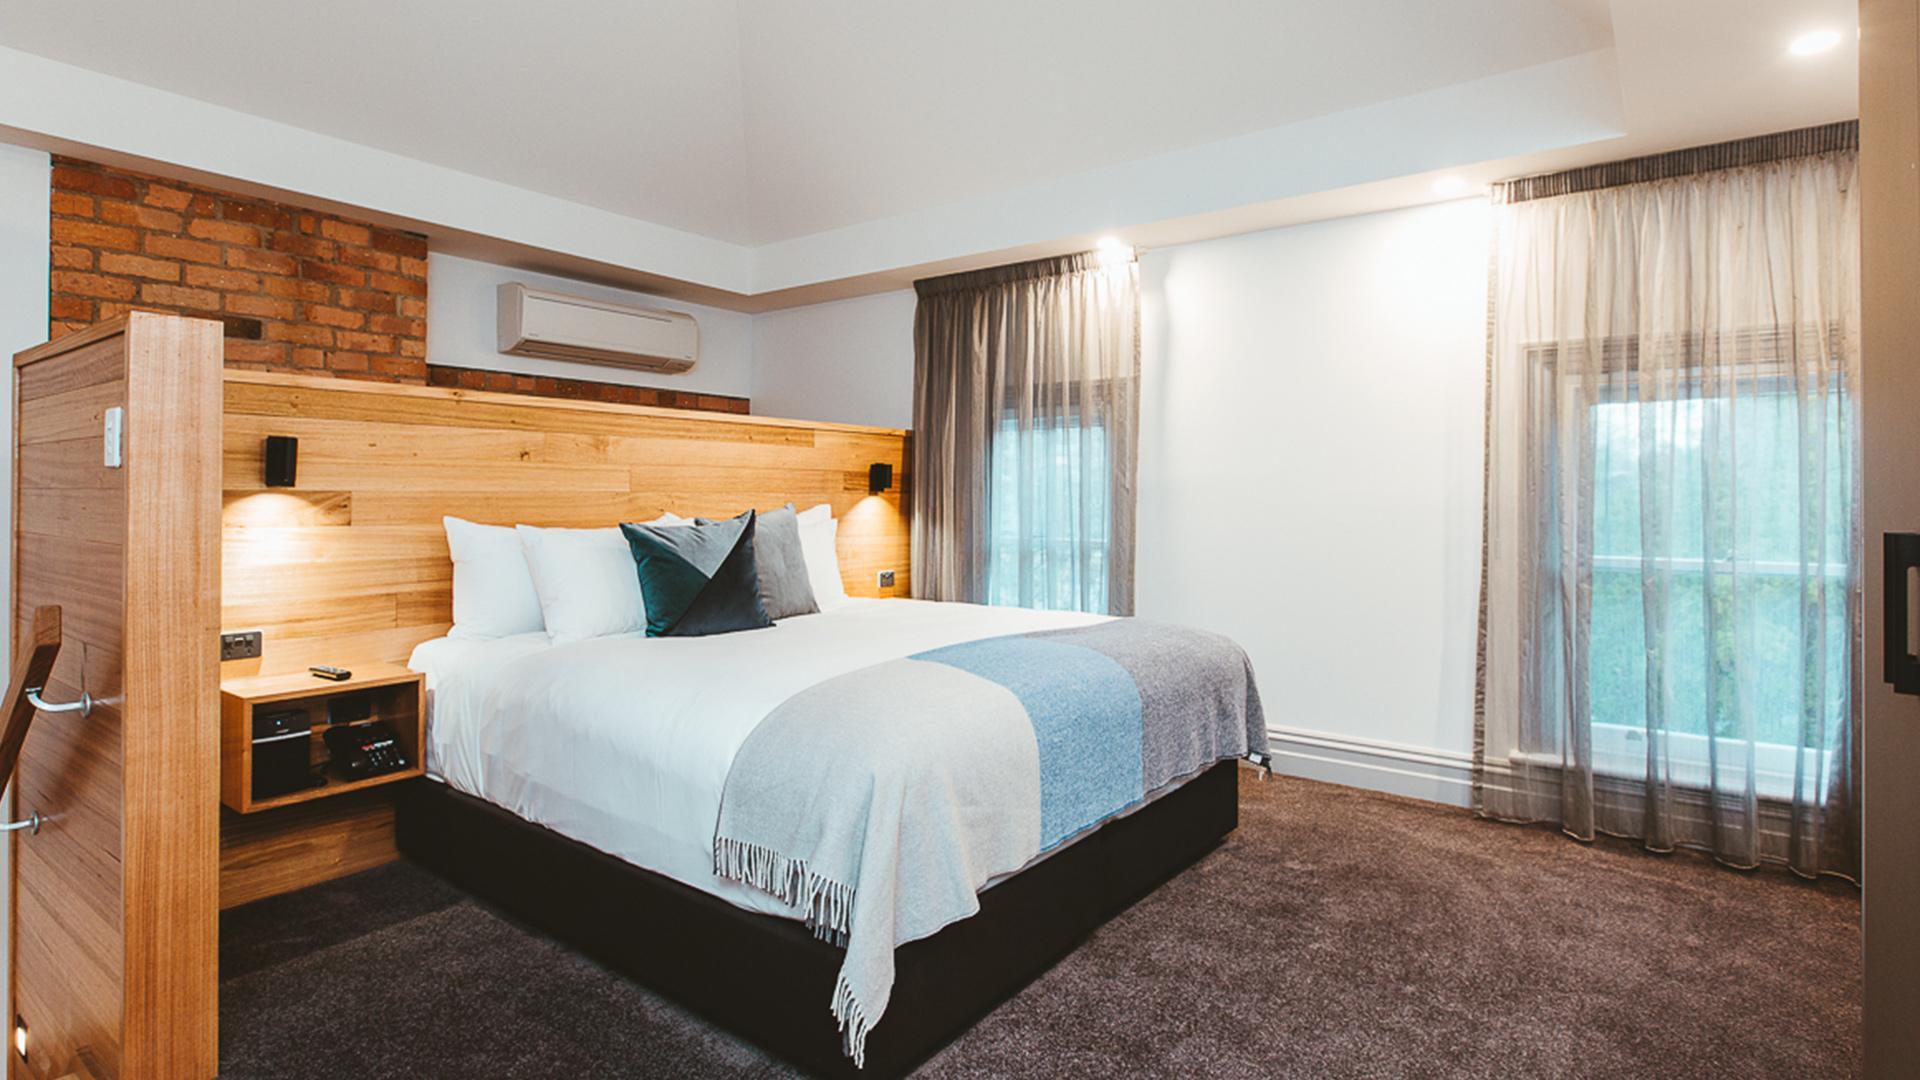 Hunter Two-Bedroom Studio image 1 at Maylands Lodge by Hobart City Council, Tasmania, Australia